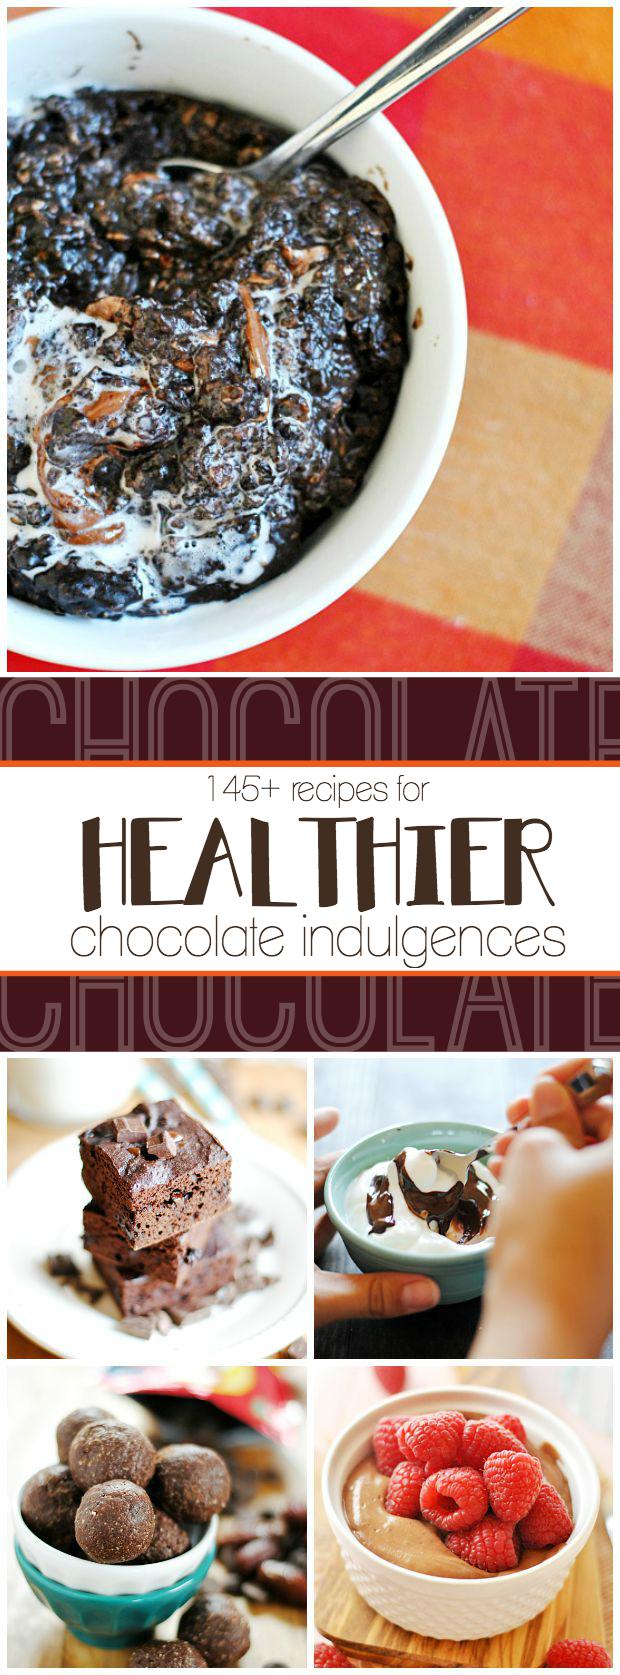 145+ Recipes for Healthier Chocolate Desserts